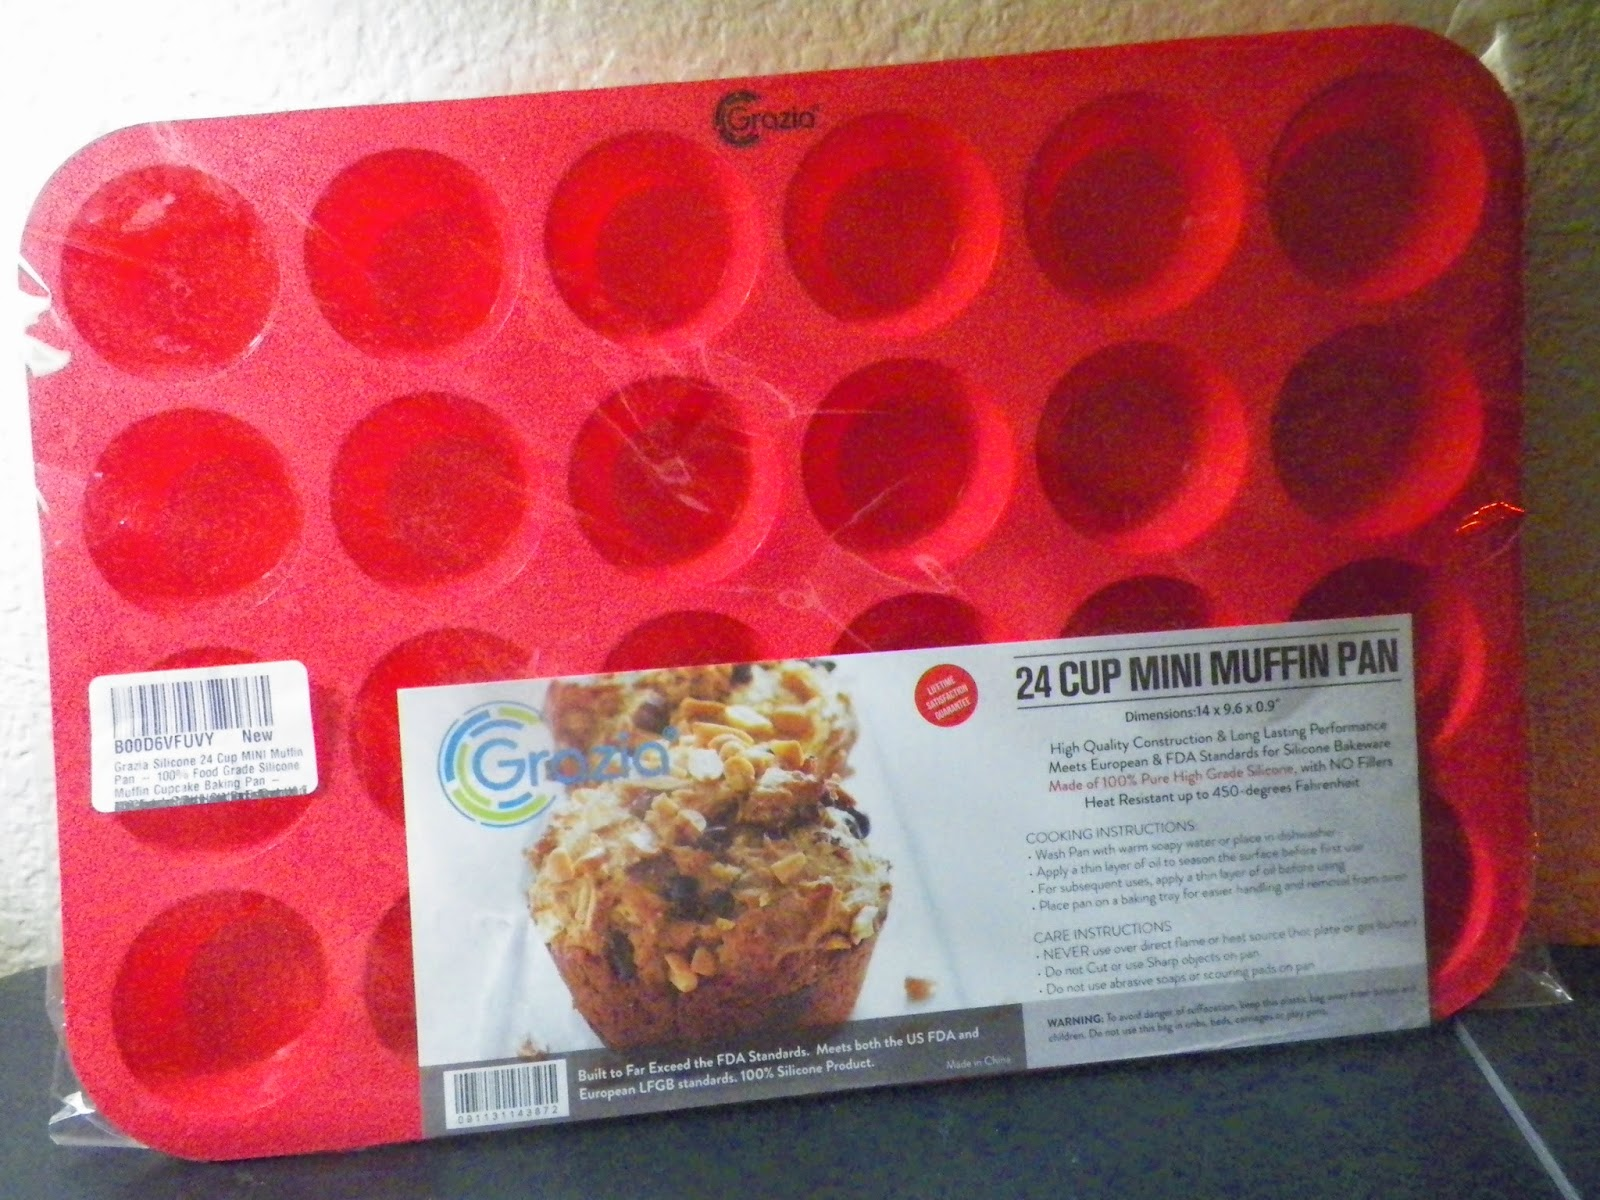 mygreatfinds: Grazia 24-Cup Silicone Mini Muffin Pan Review